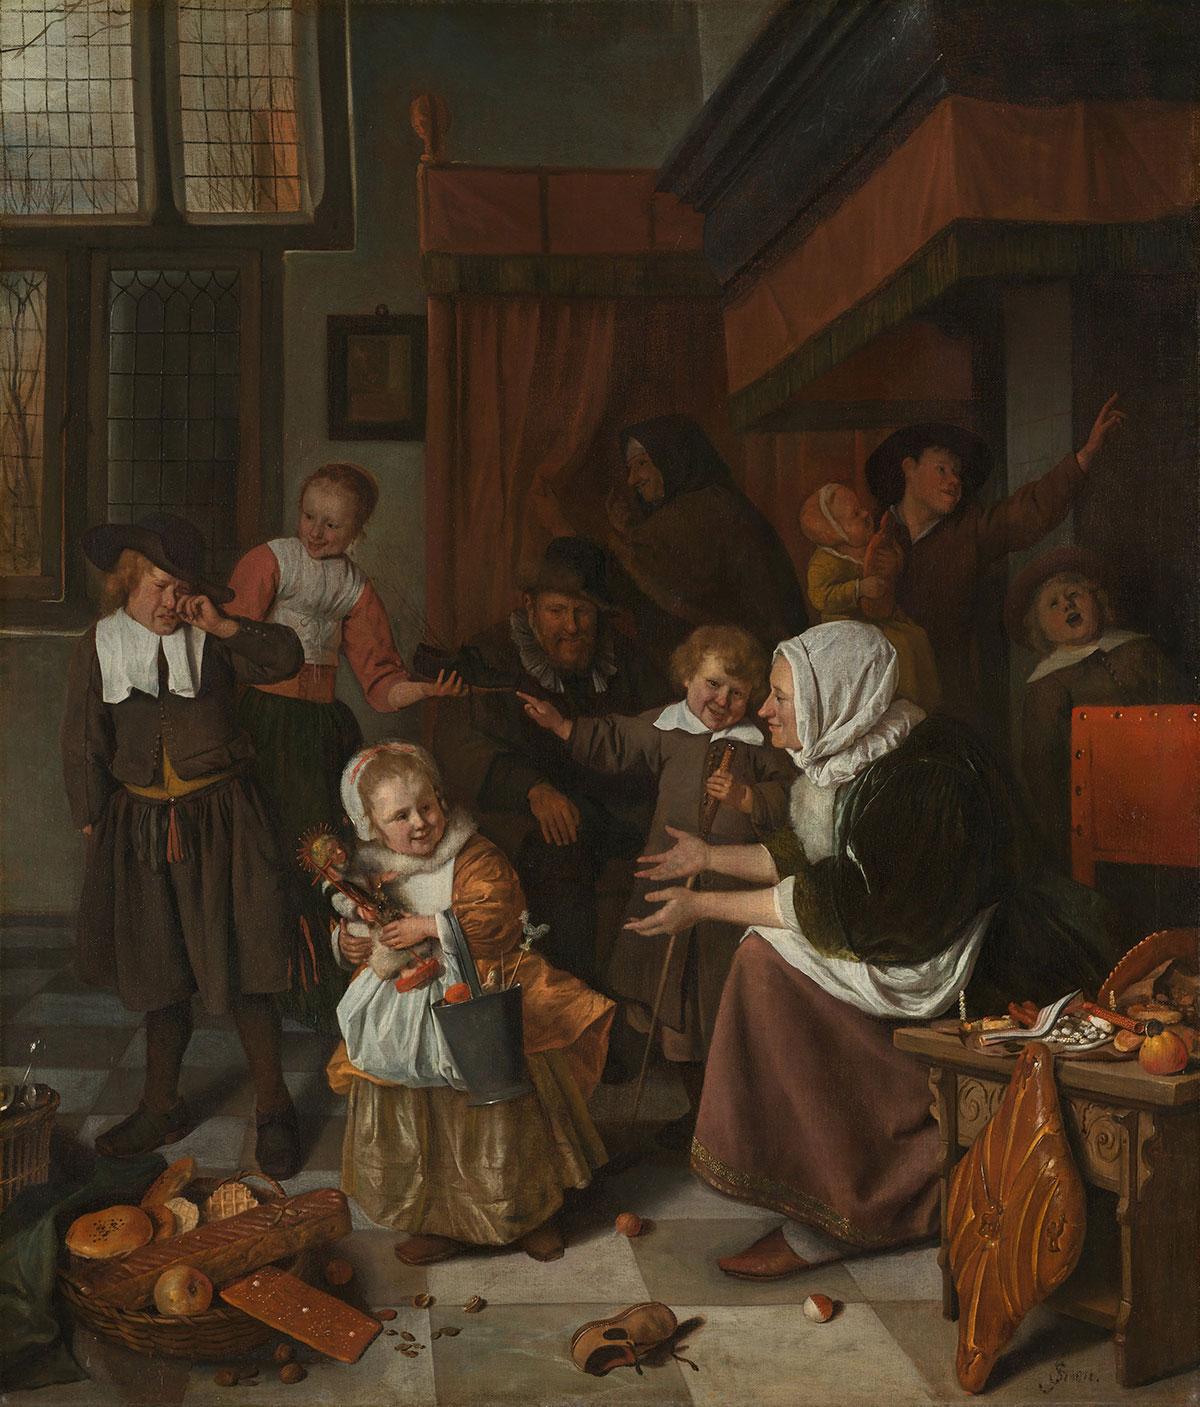 The Feast of Saint Nicholas /Het Sint-Nicolaasfeest/ + Steen, Jan *magnifico